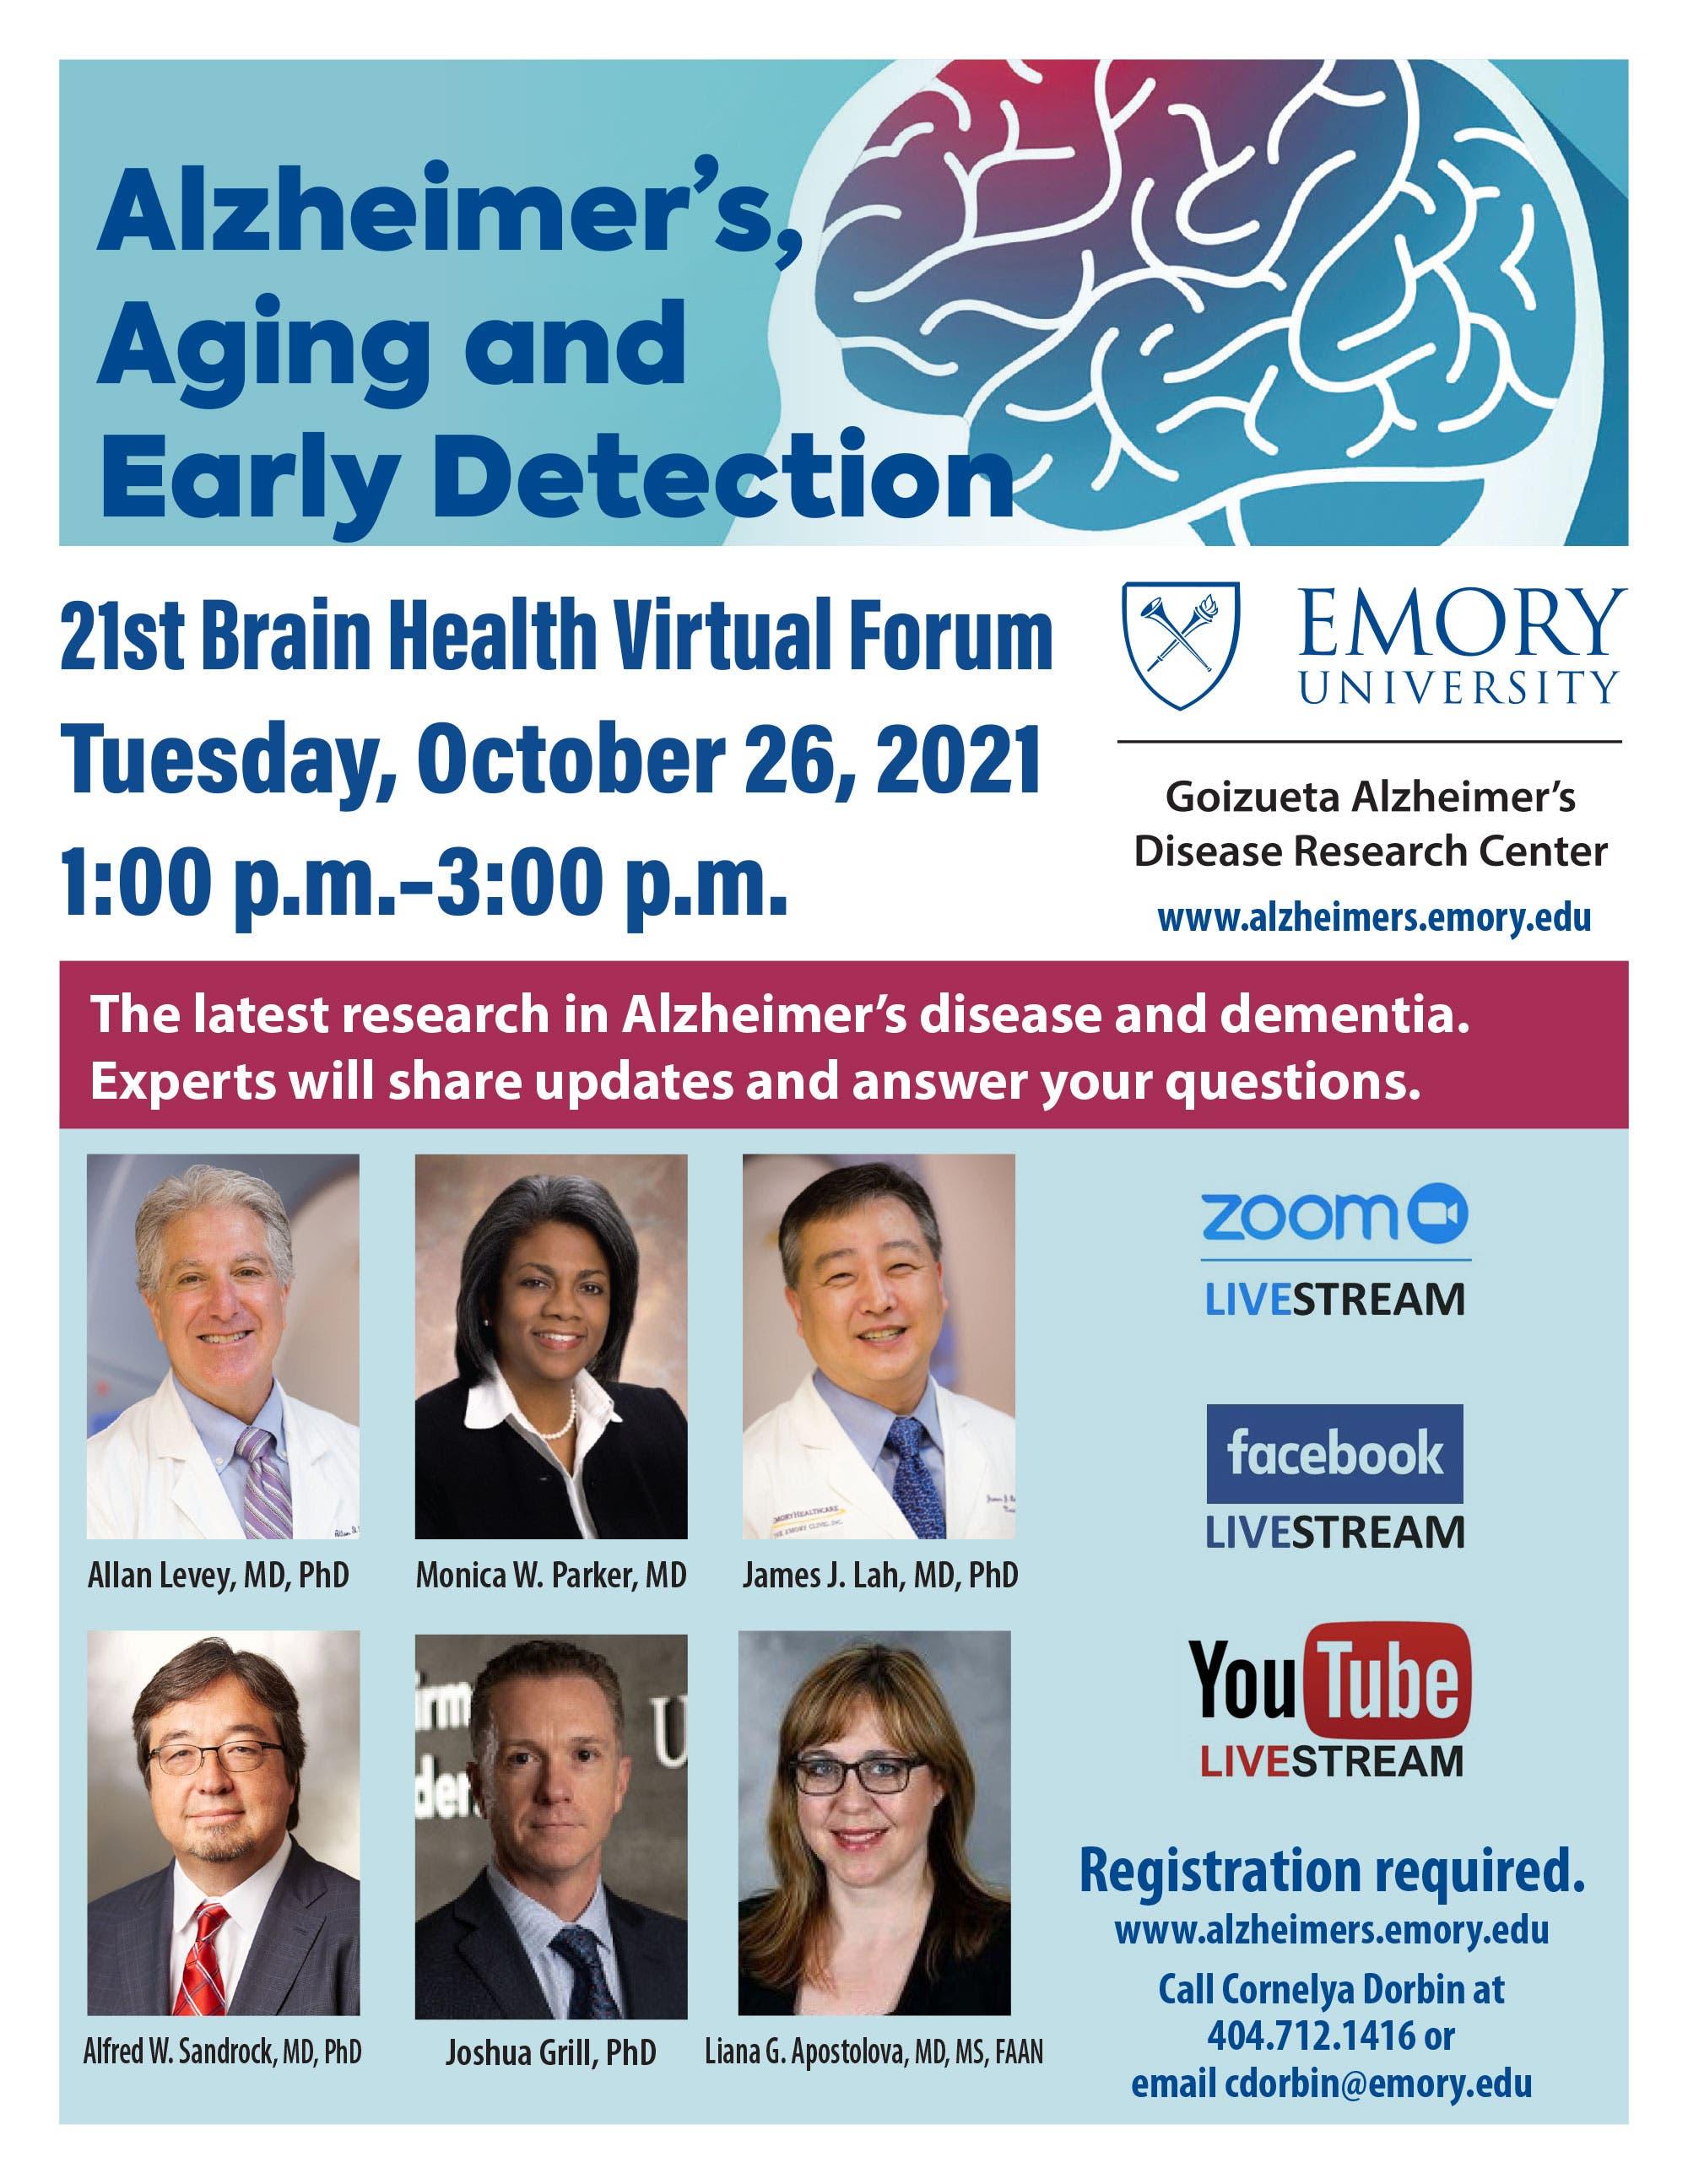 Emory 21st Brain Health Forum